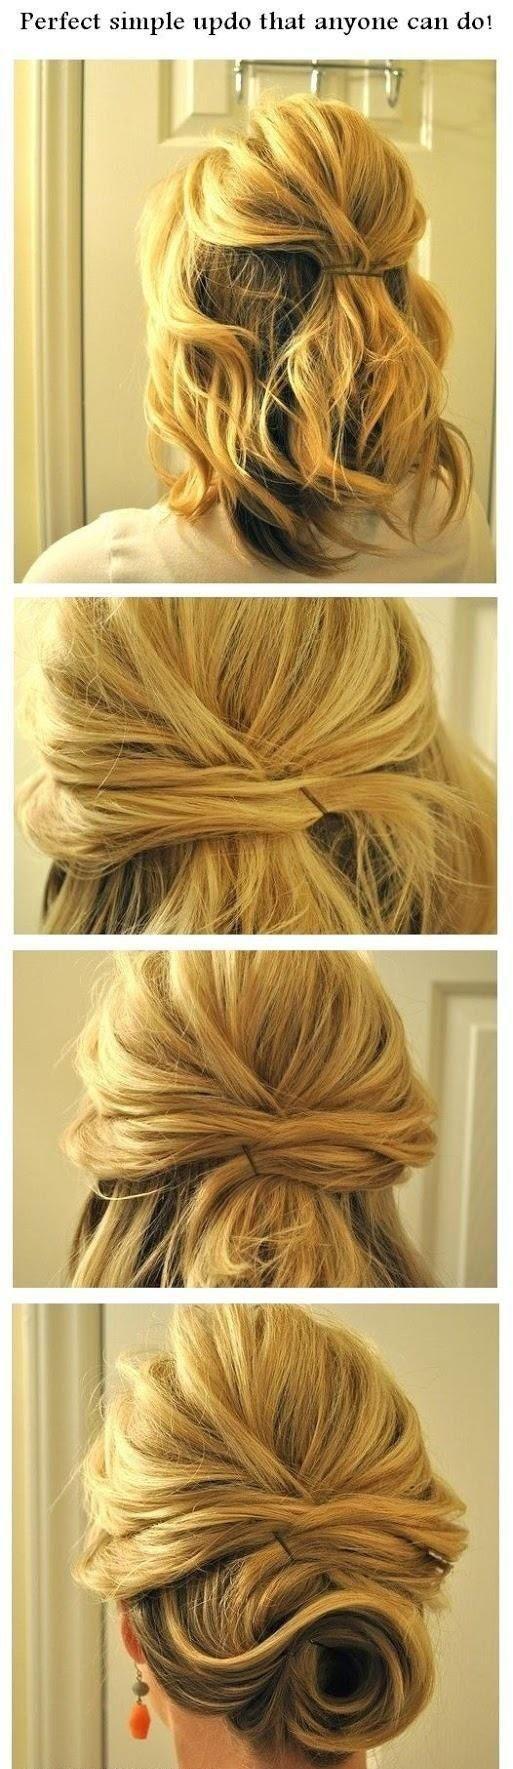 15 Tutoriels Pour Cheveux courts Hairstyle / coiffure